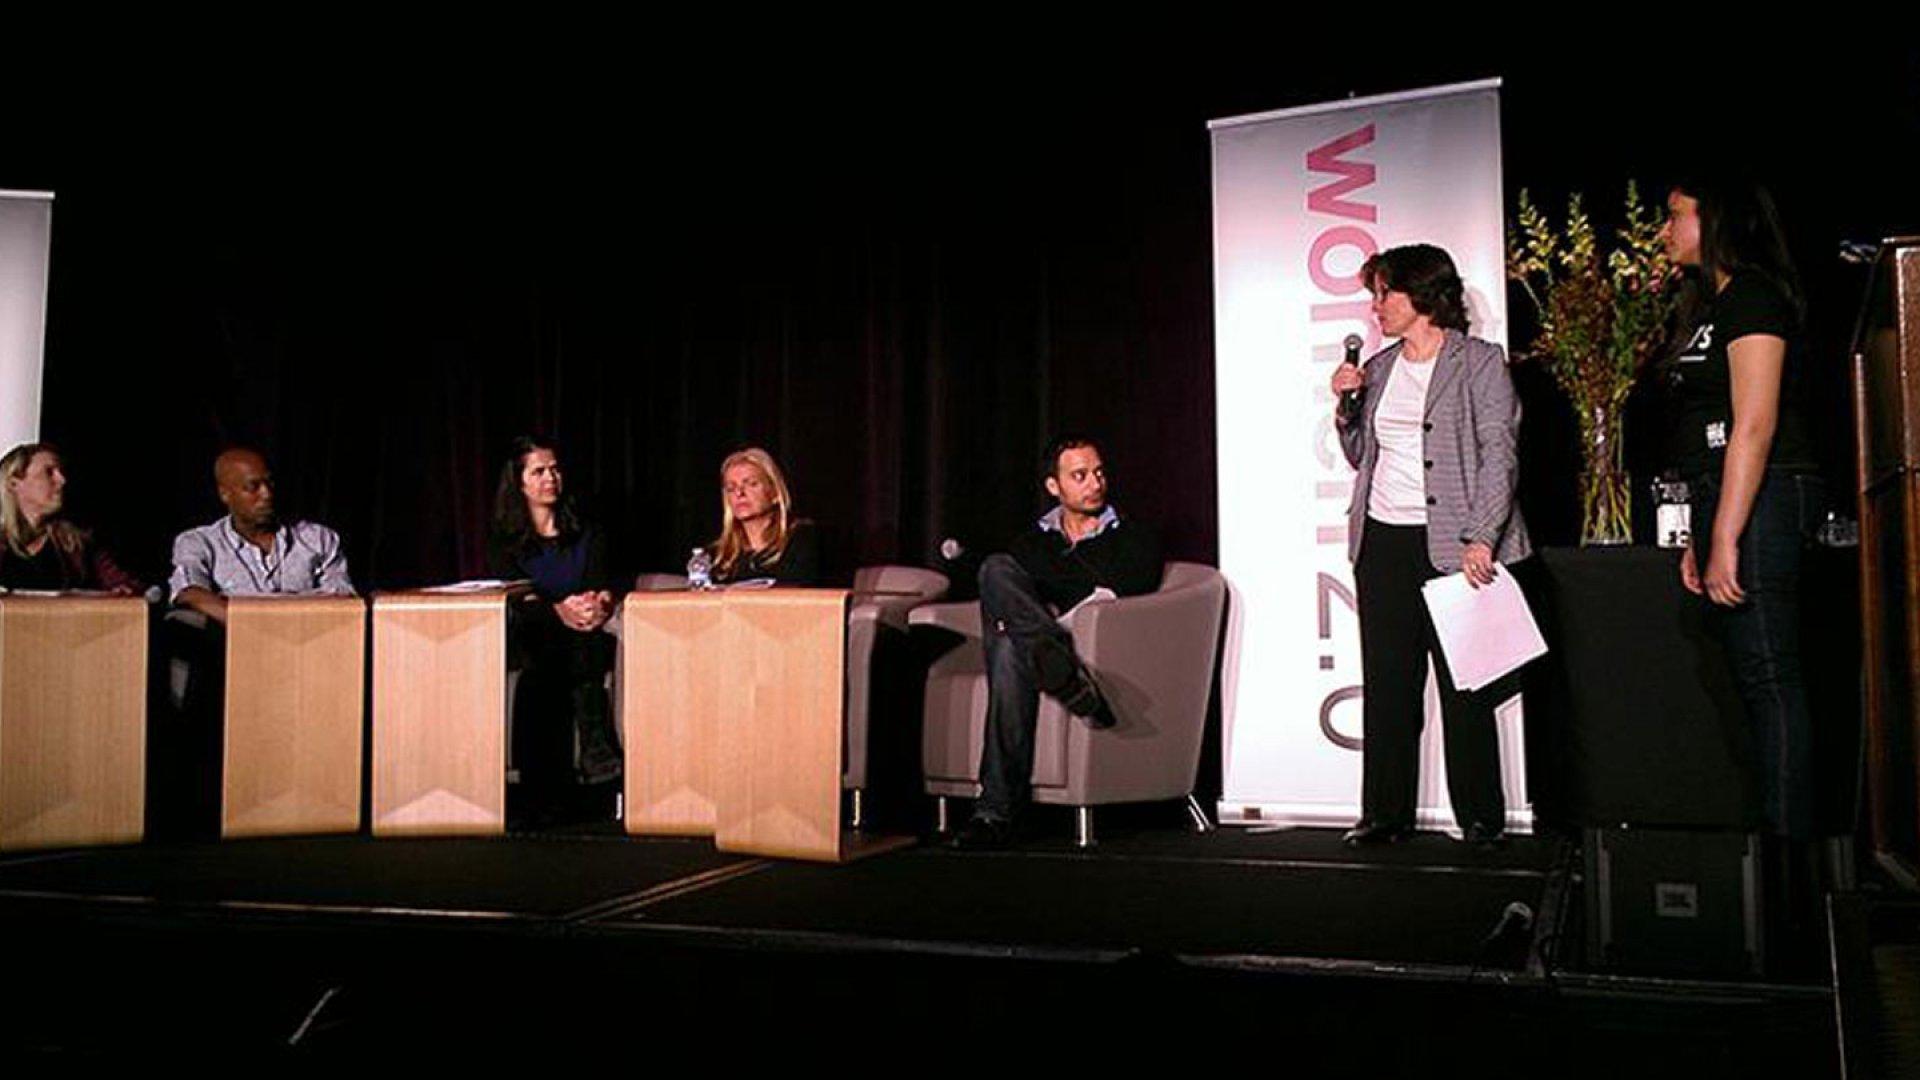 5 Women-Led Start-ups to Watch